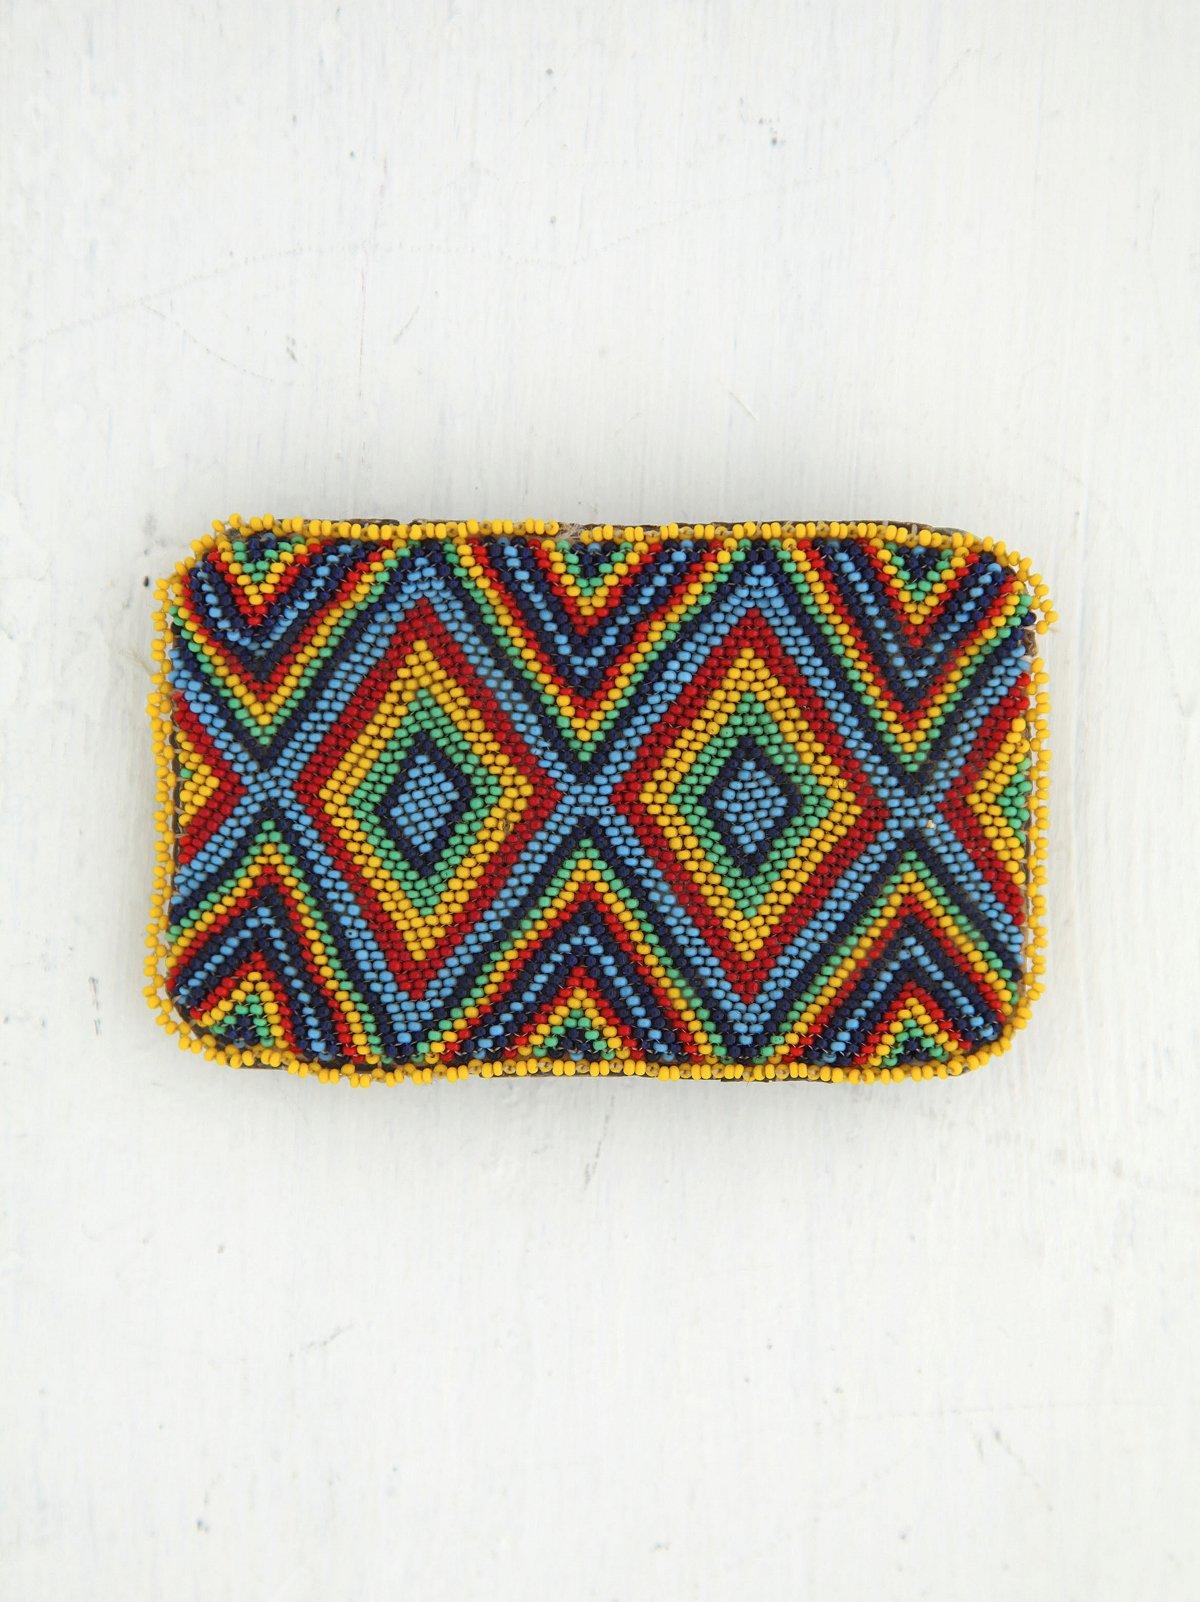 Vintage Multicolor Beaded Belt Buckle